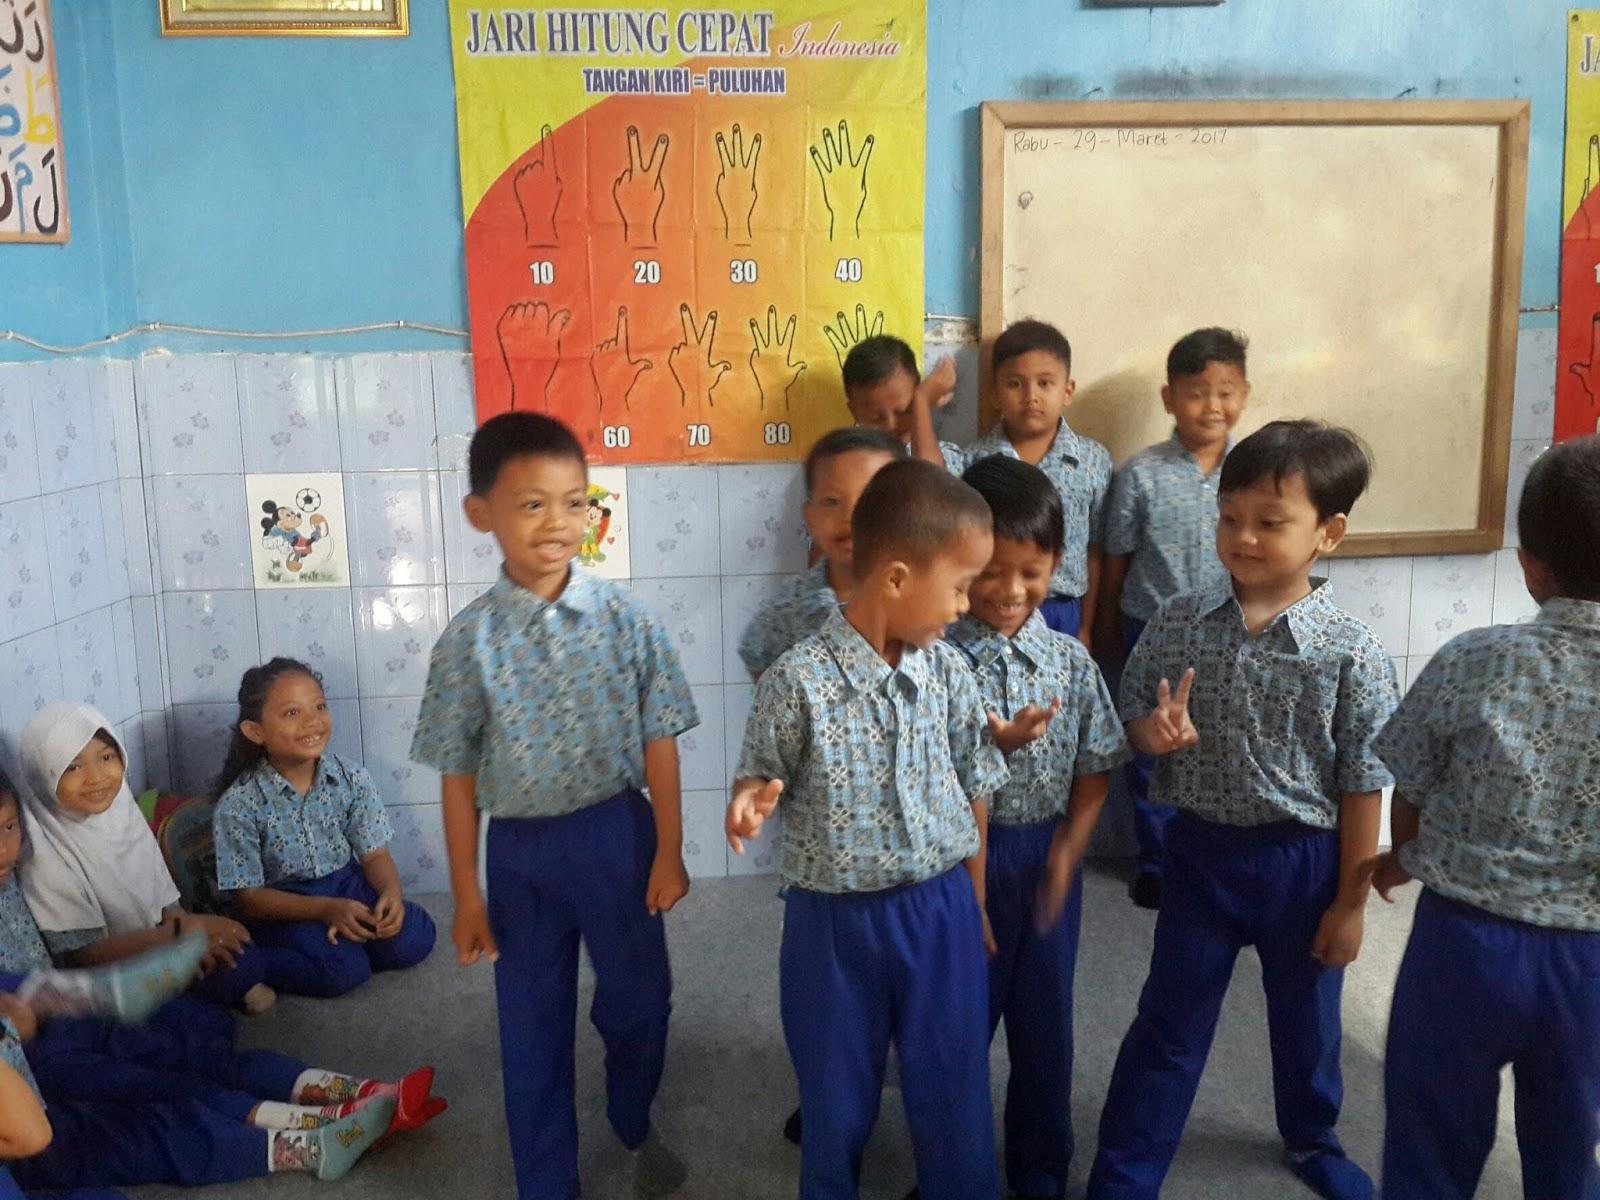 Pada hari Rabu 29 Maret 2017 adalah hari kedua penulis mendampingi proses belajar mengajar di Paud Yayasan Lautan Amal Pukul 08 00 WIB penulis sampai di